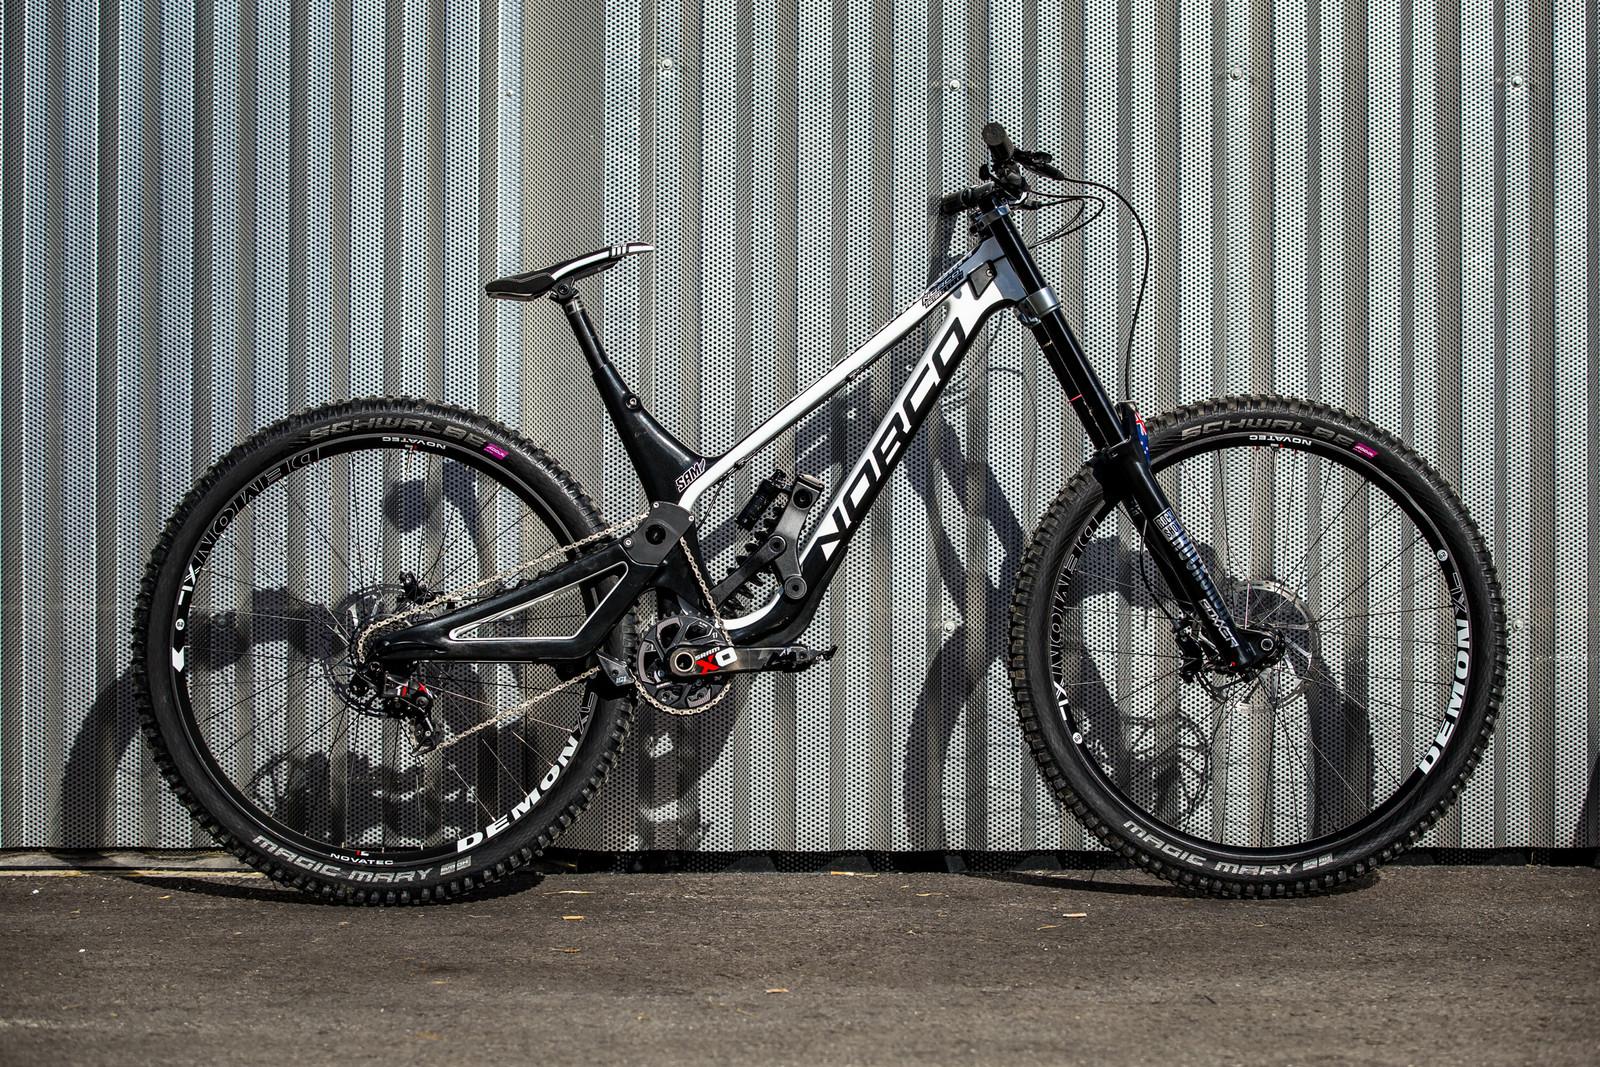 WORLD CHAMPS BIKE - Sam Blenkinsop's Norco Aurum HSP - WORLD CHAMPS BIKES - Sam Blenkinsop and Henry Fitzgerald's Norco Aurum HSP's - Mountain Biking Pictures - Vital MTB